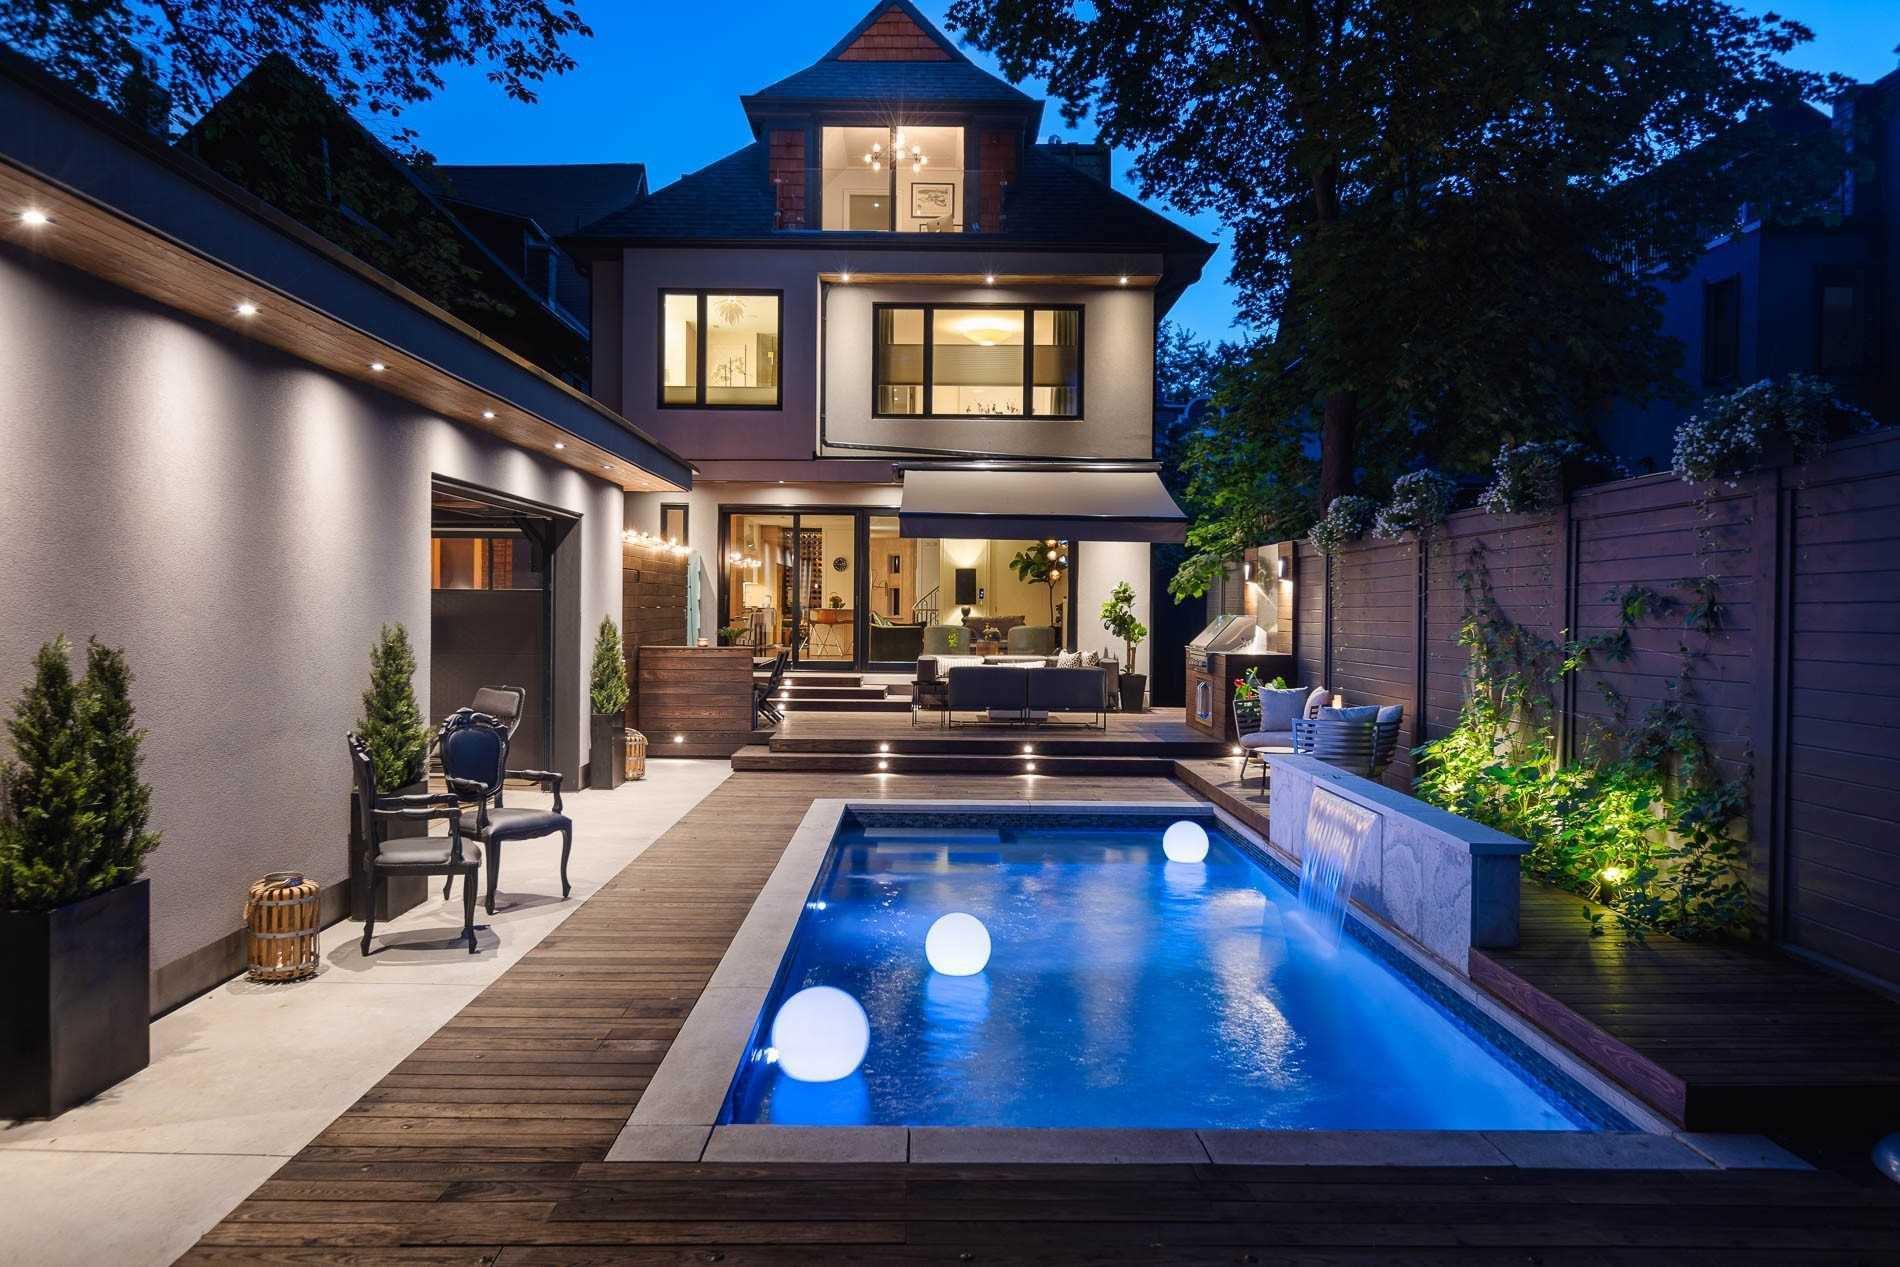 Photo 20: Photos: 45 Admiral Road in Toronto: Annex House (3-Storey) for sale (Toronto C02)  : MLS®# C4612730